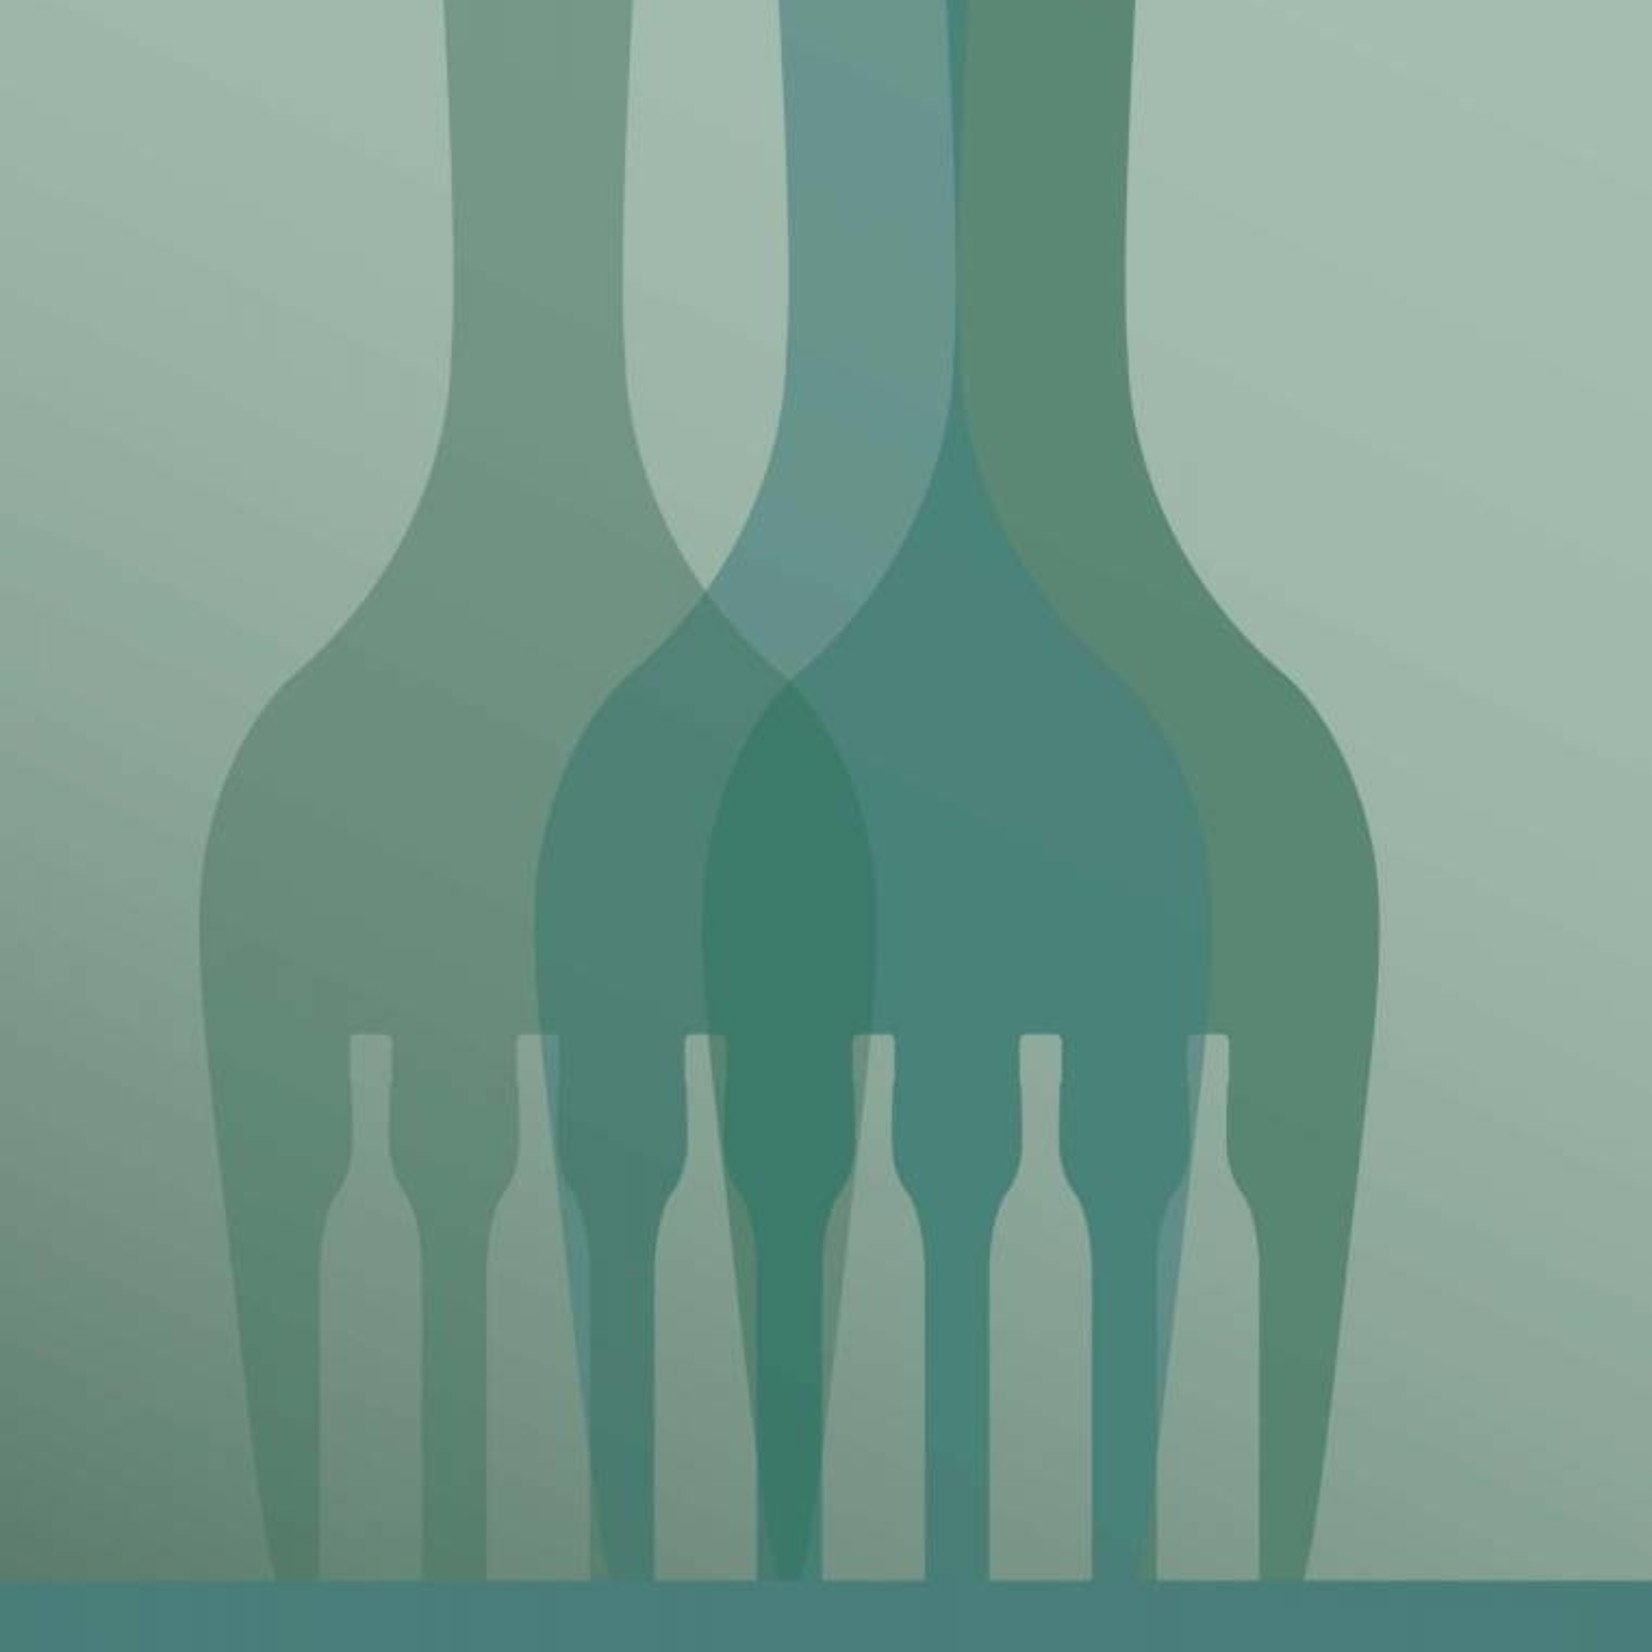 Vissevasse Poster - Wining & Dining - 3 maten